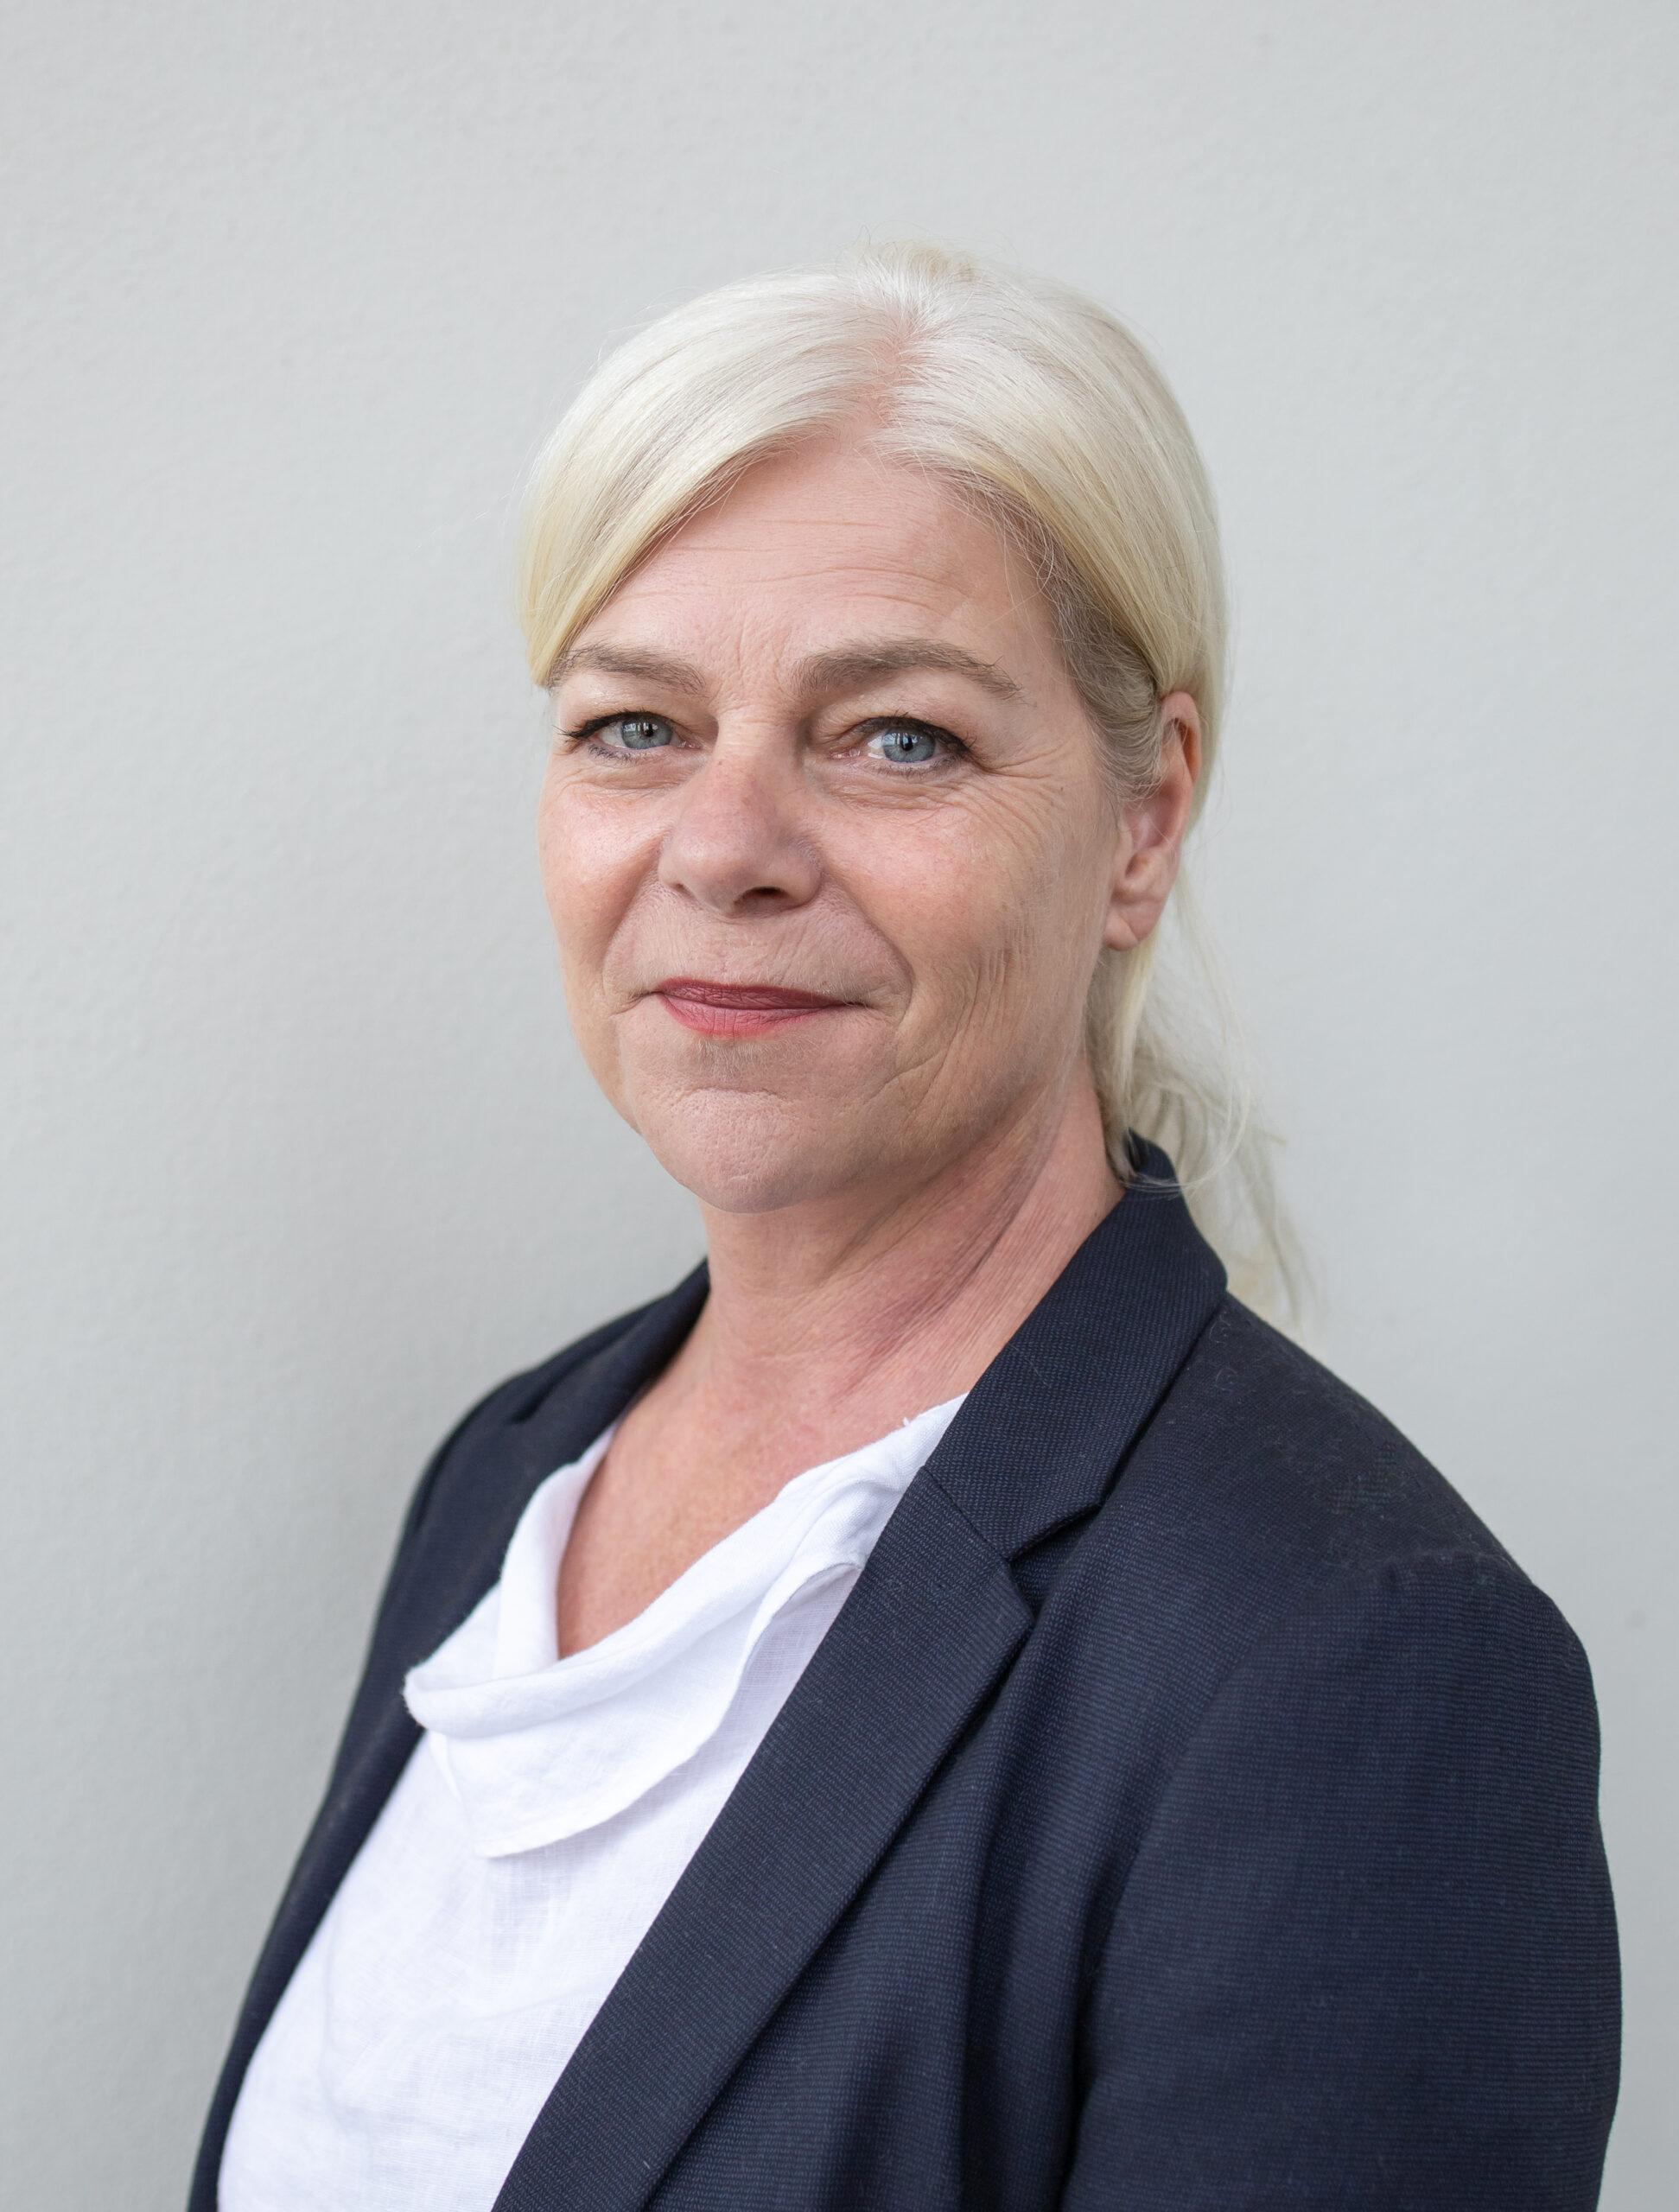 Liesbeth Pauw